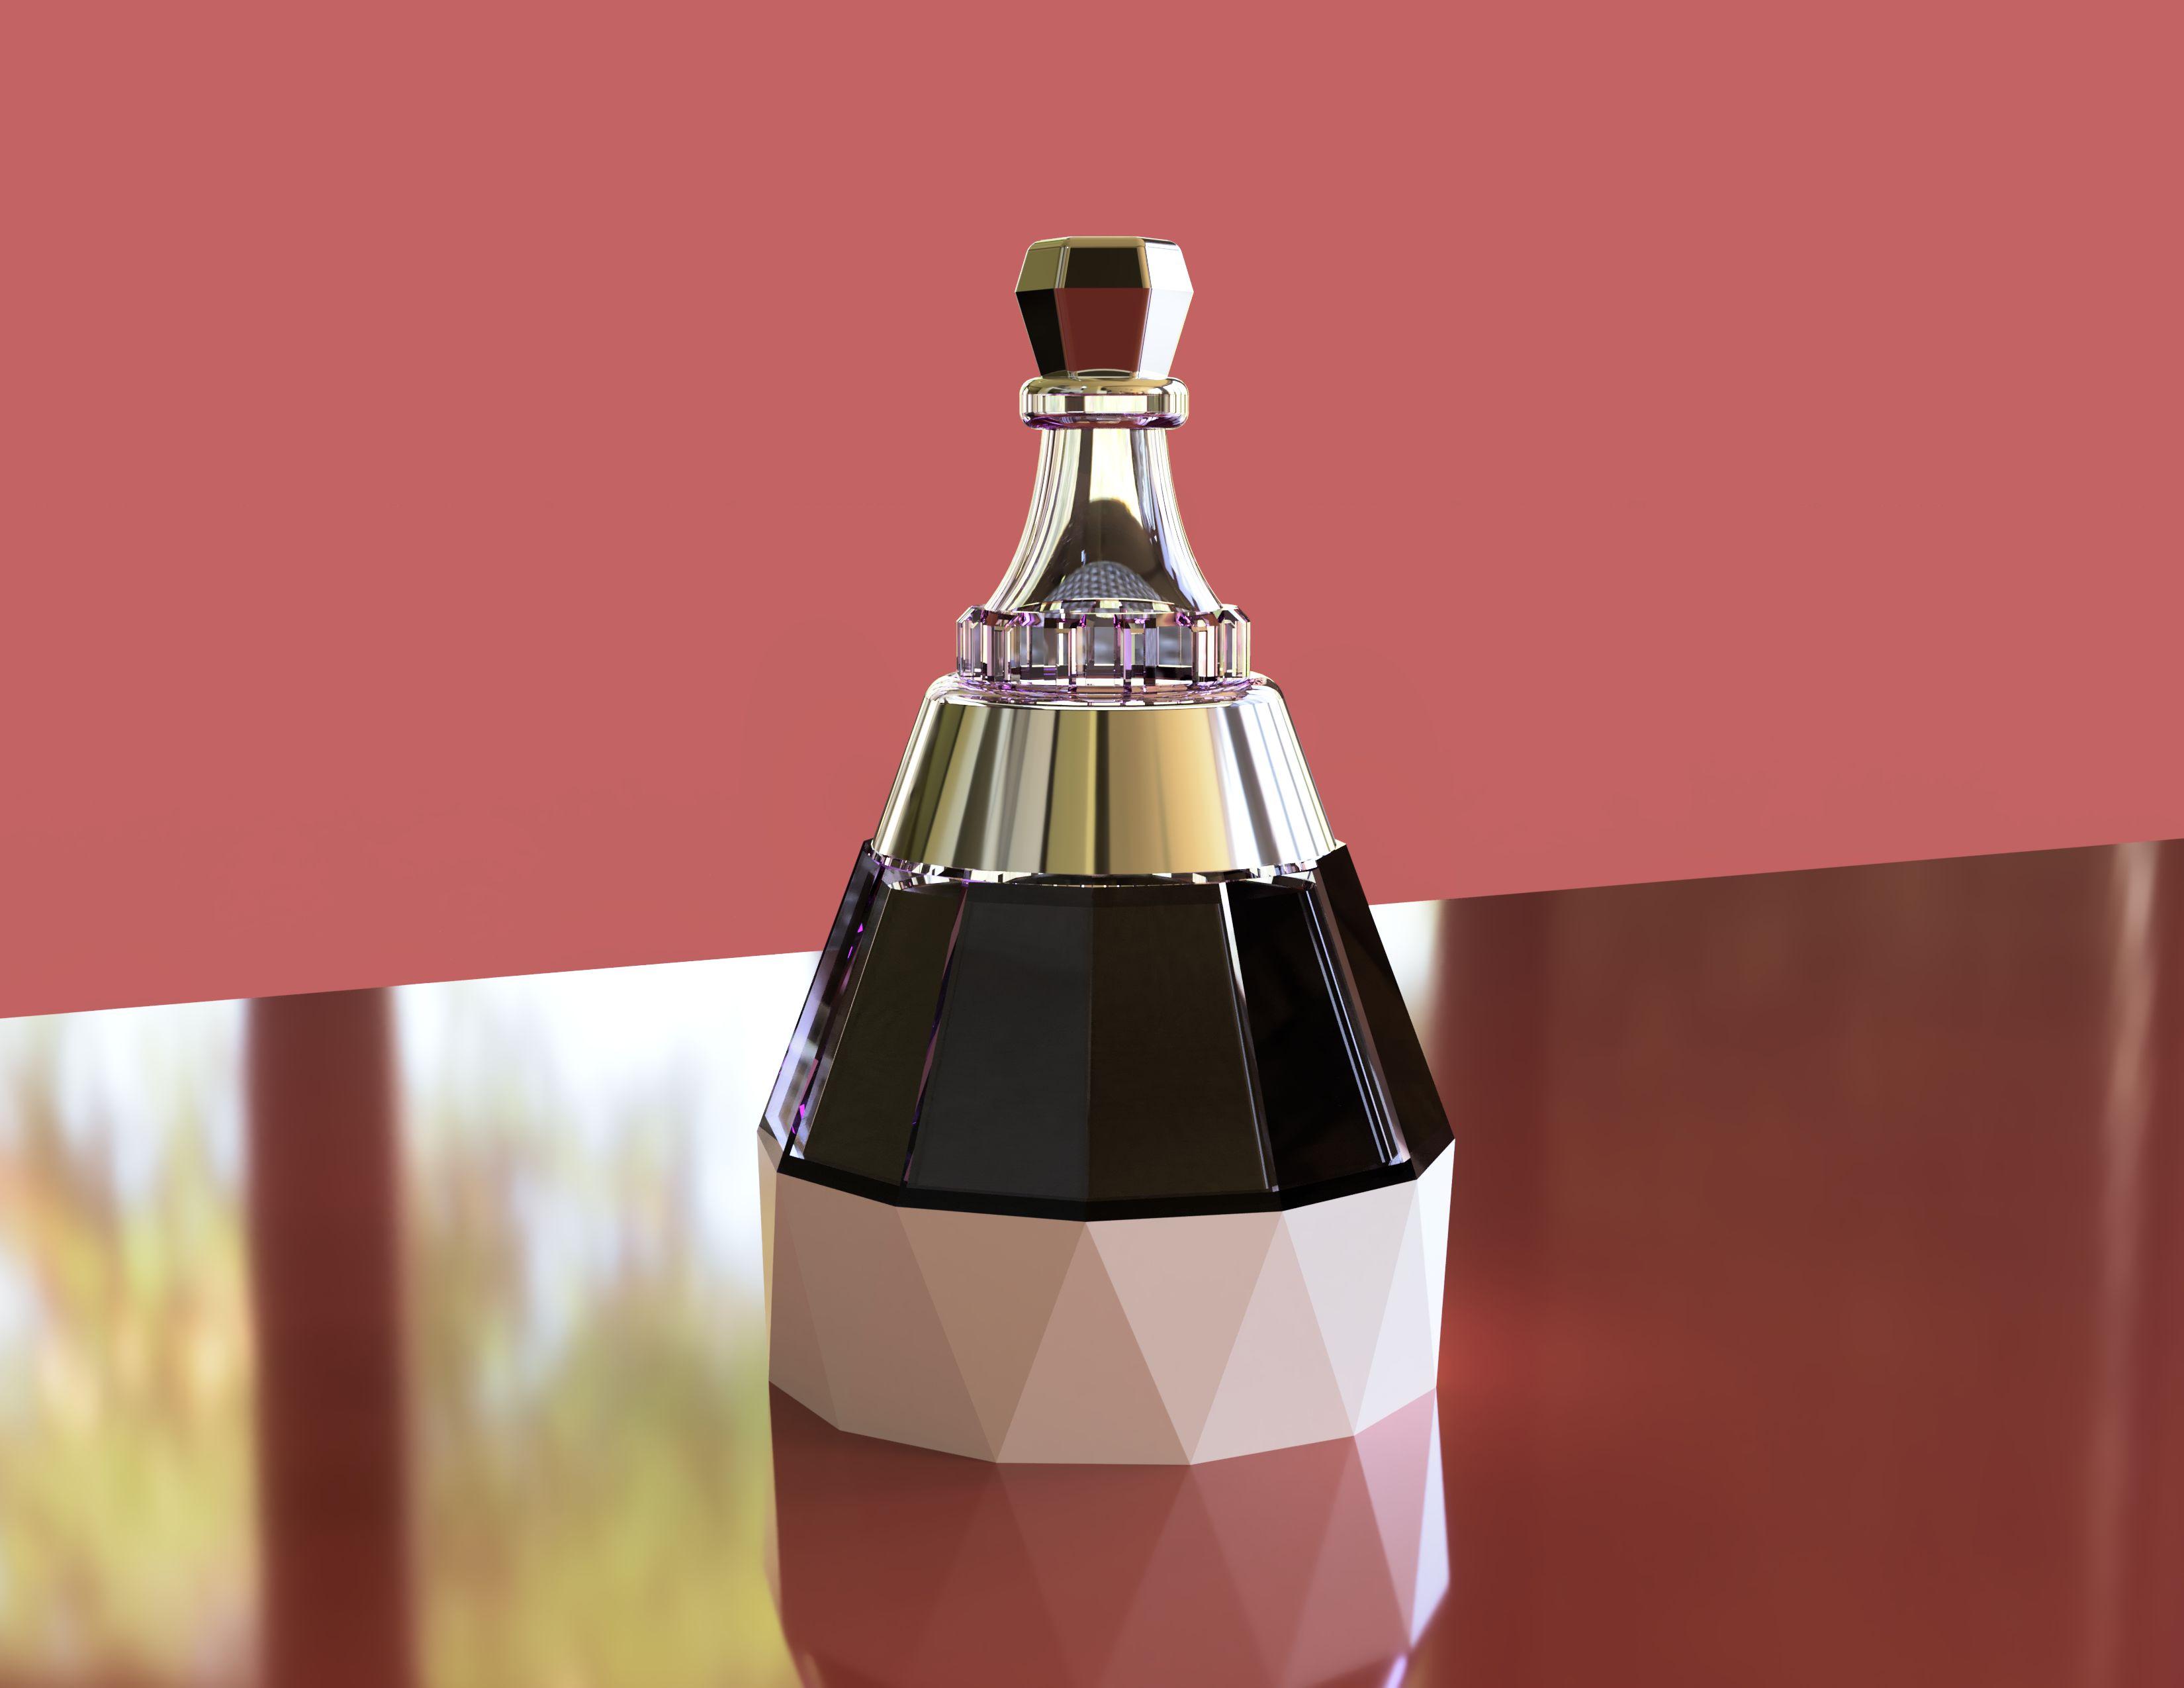 Botella-1-2020-jan-21-03-41-57am-000-customizedview26948607620-png-3500-3500